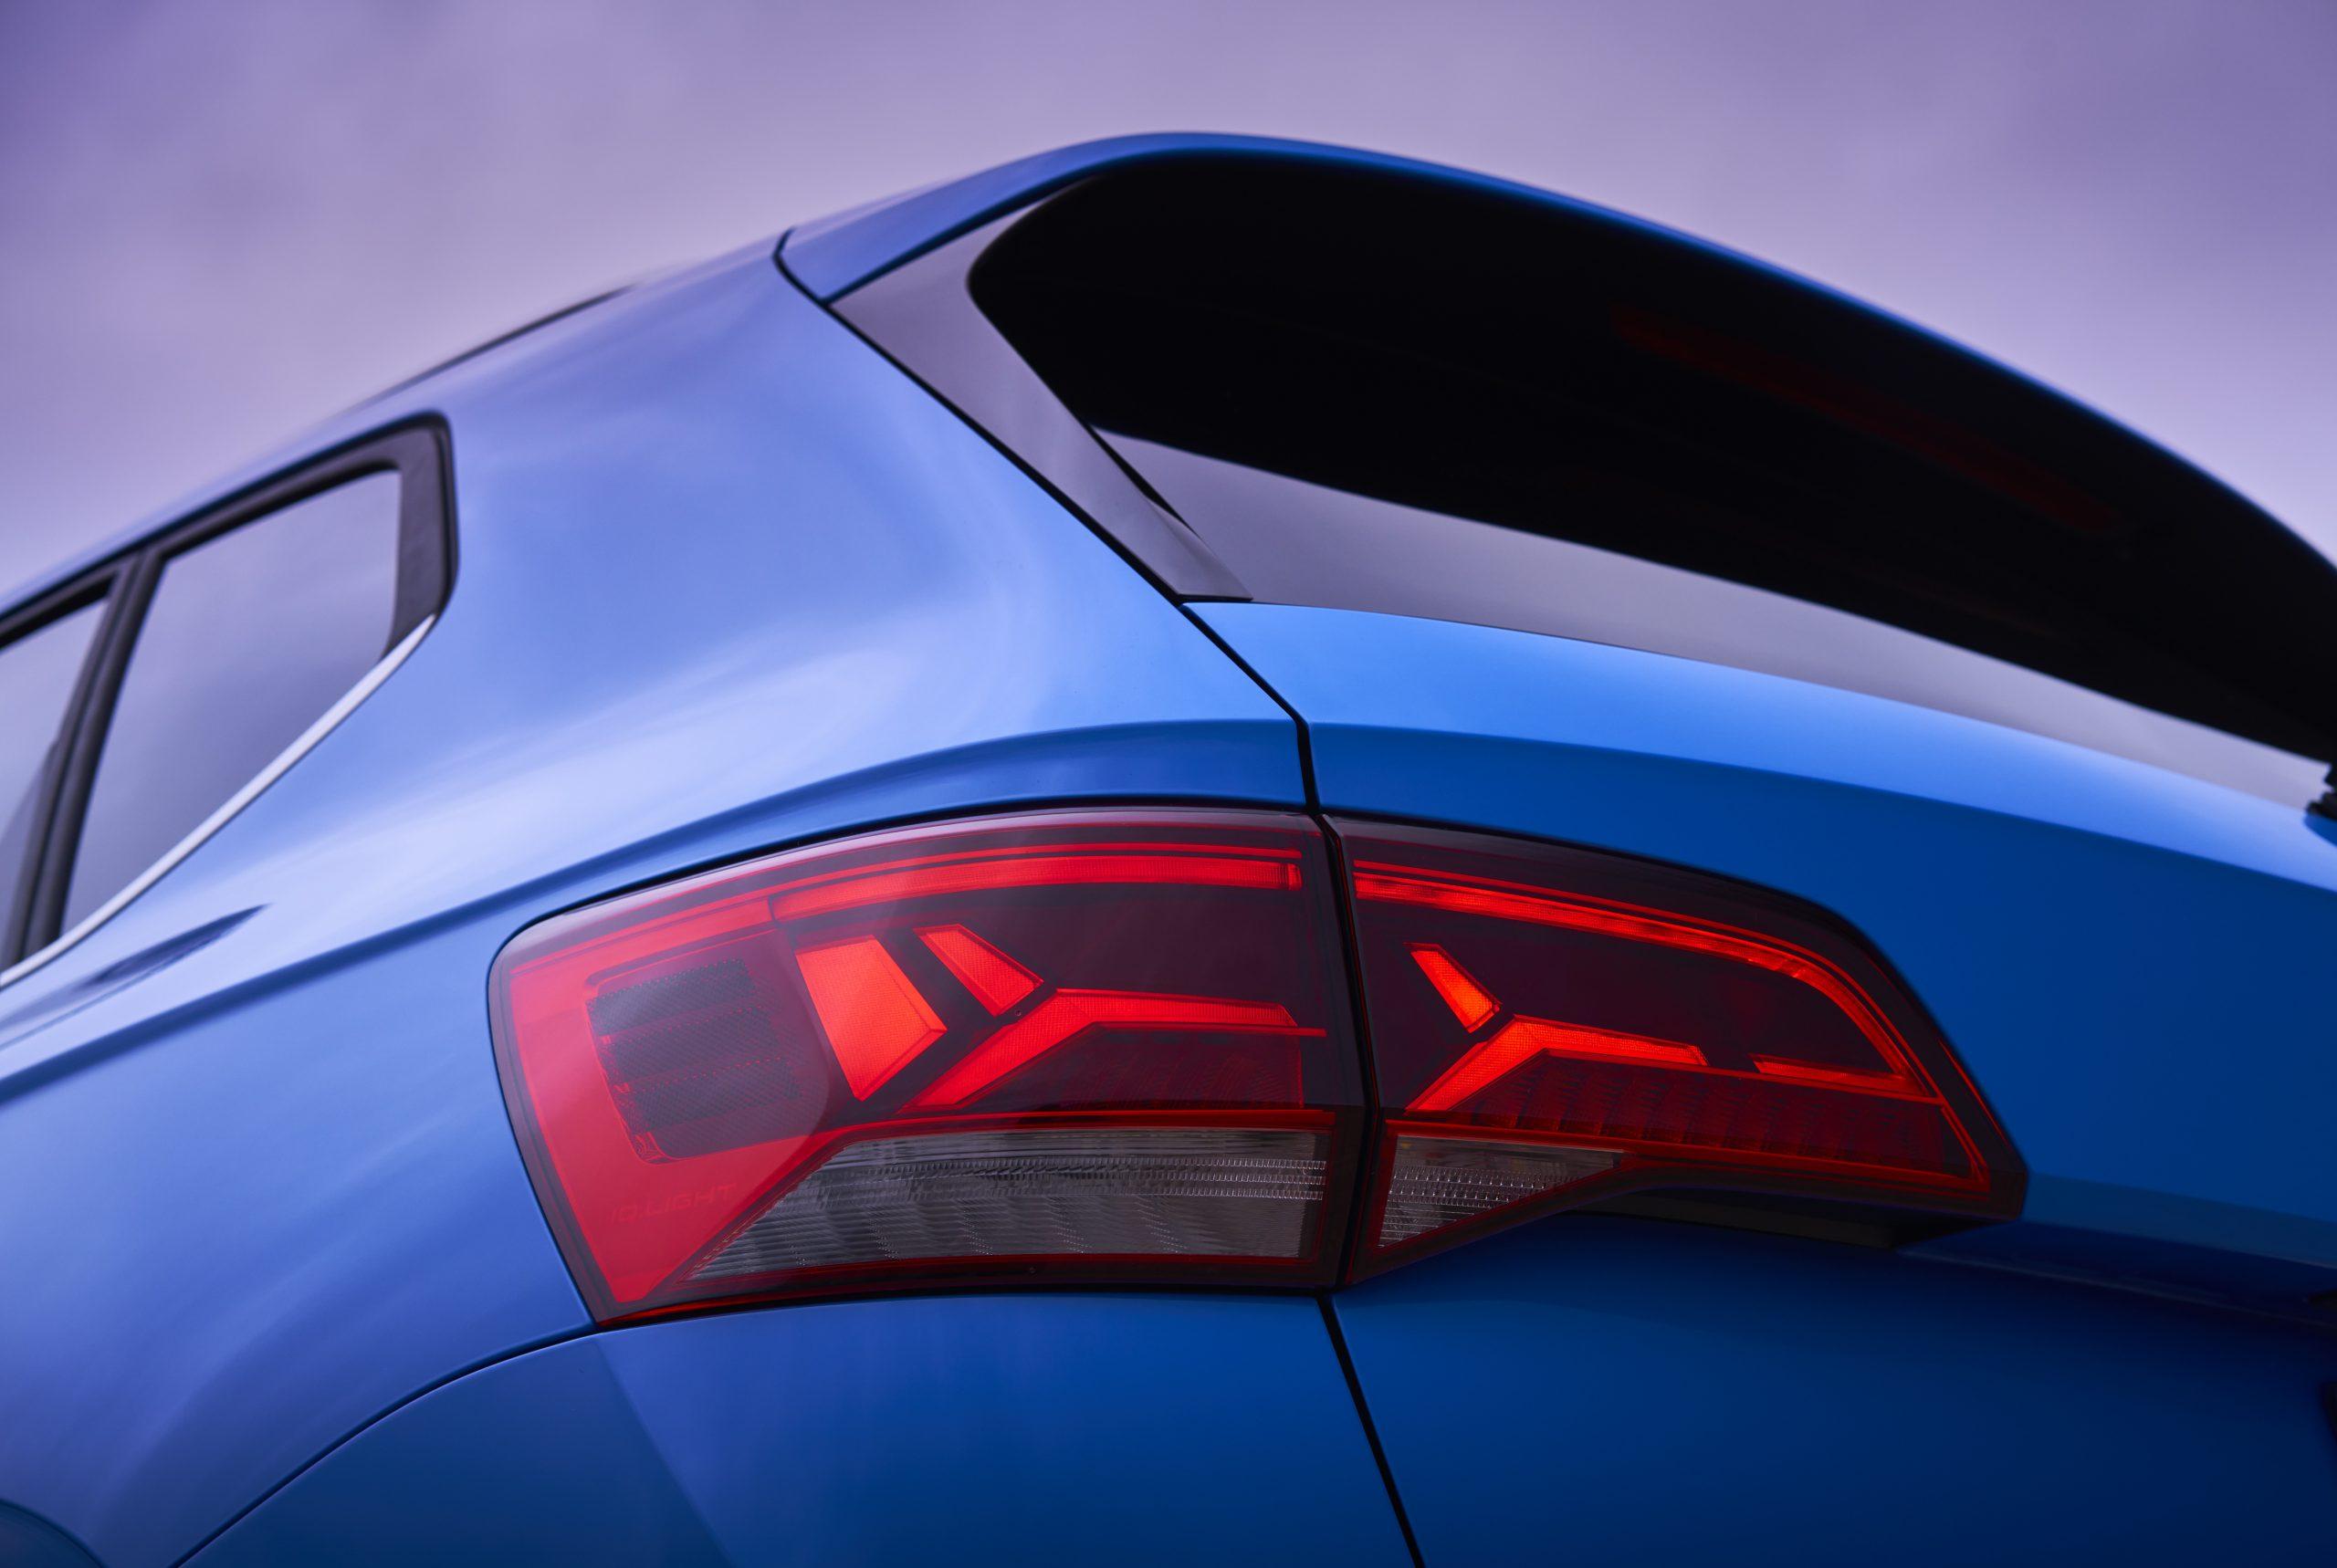 2022 Volkswagen Taos tail lamp